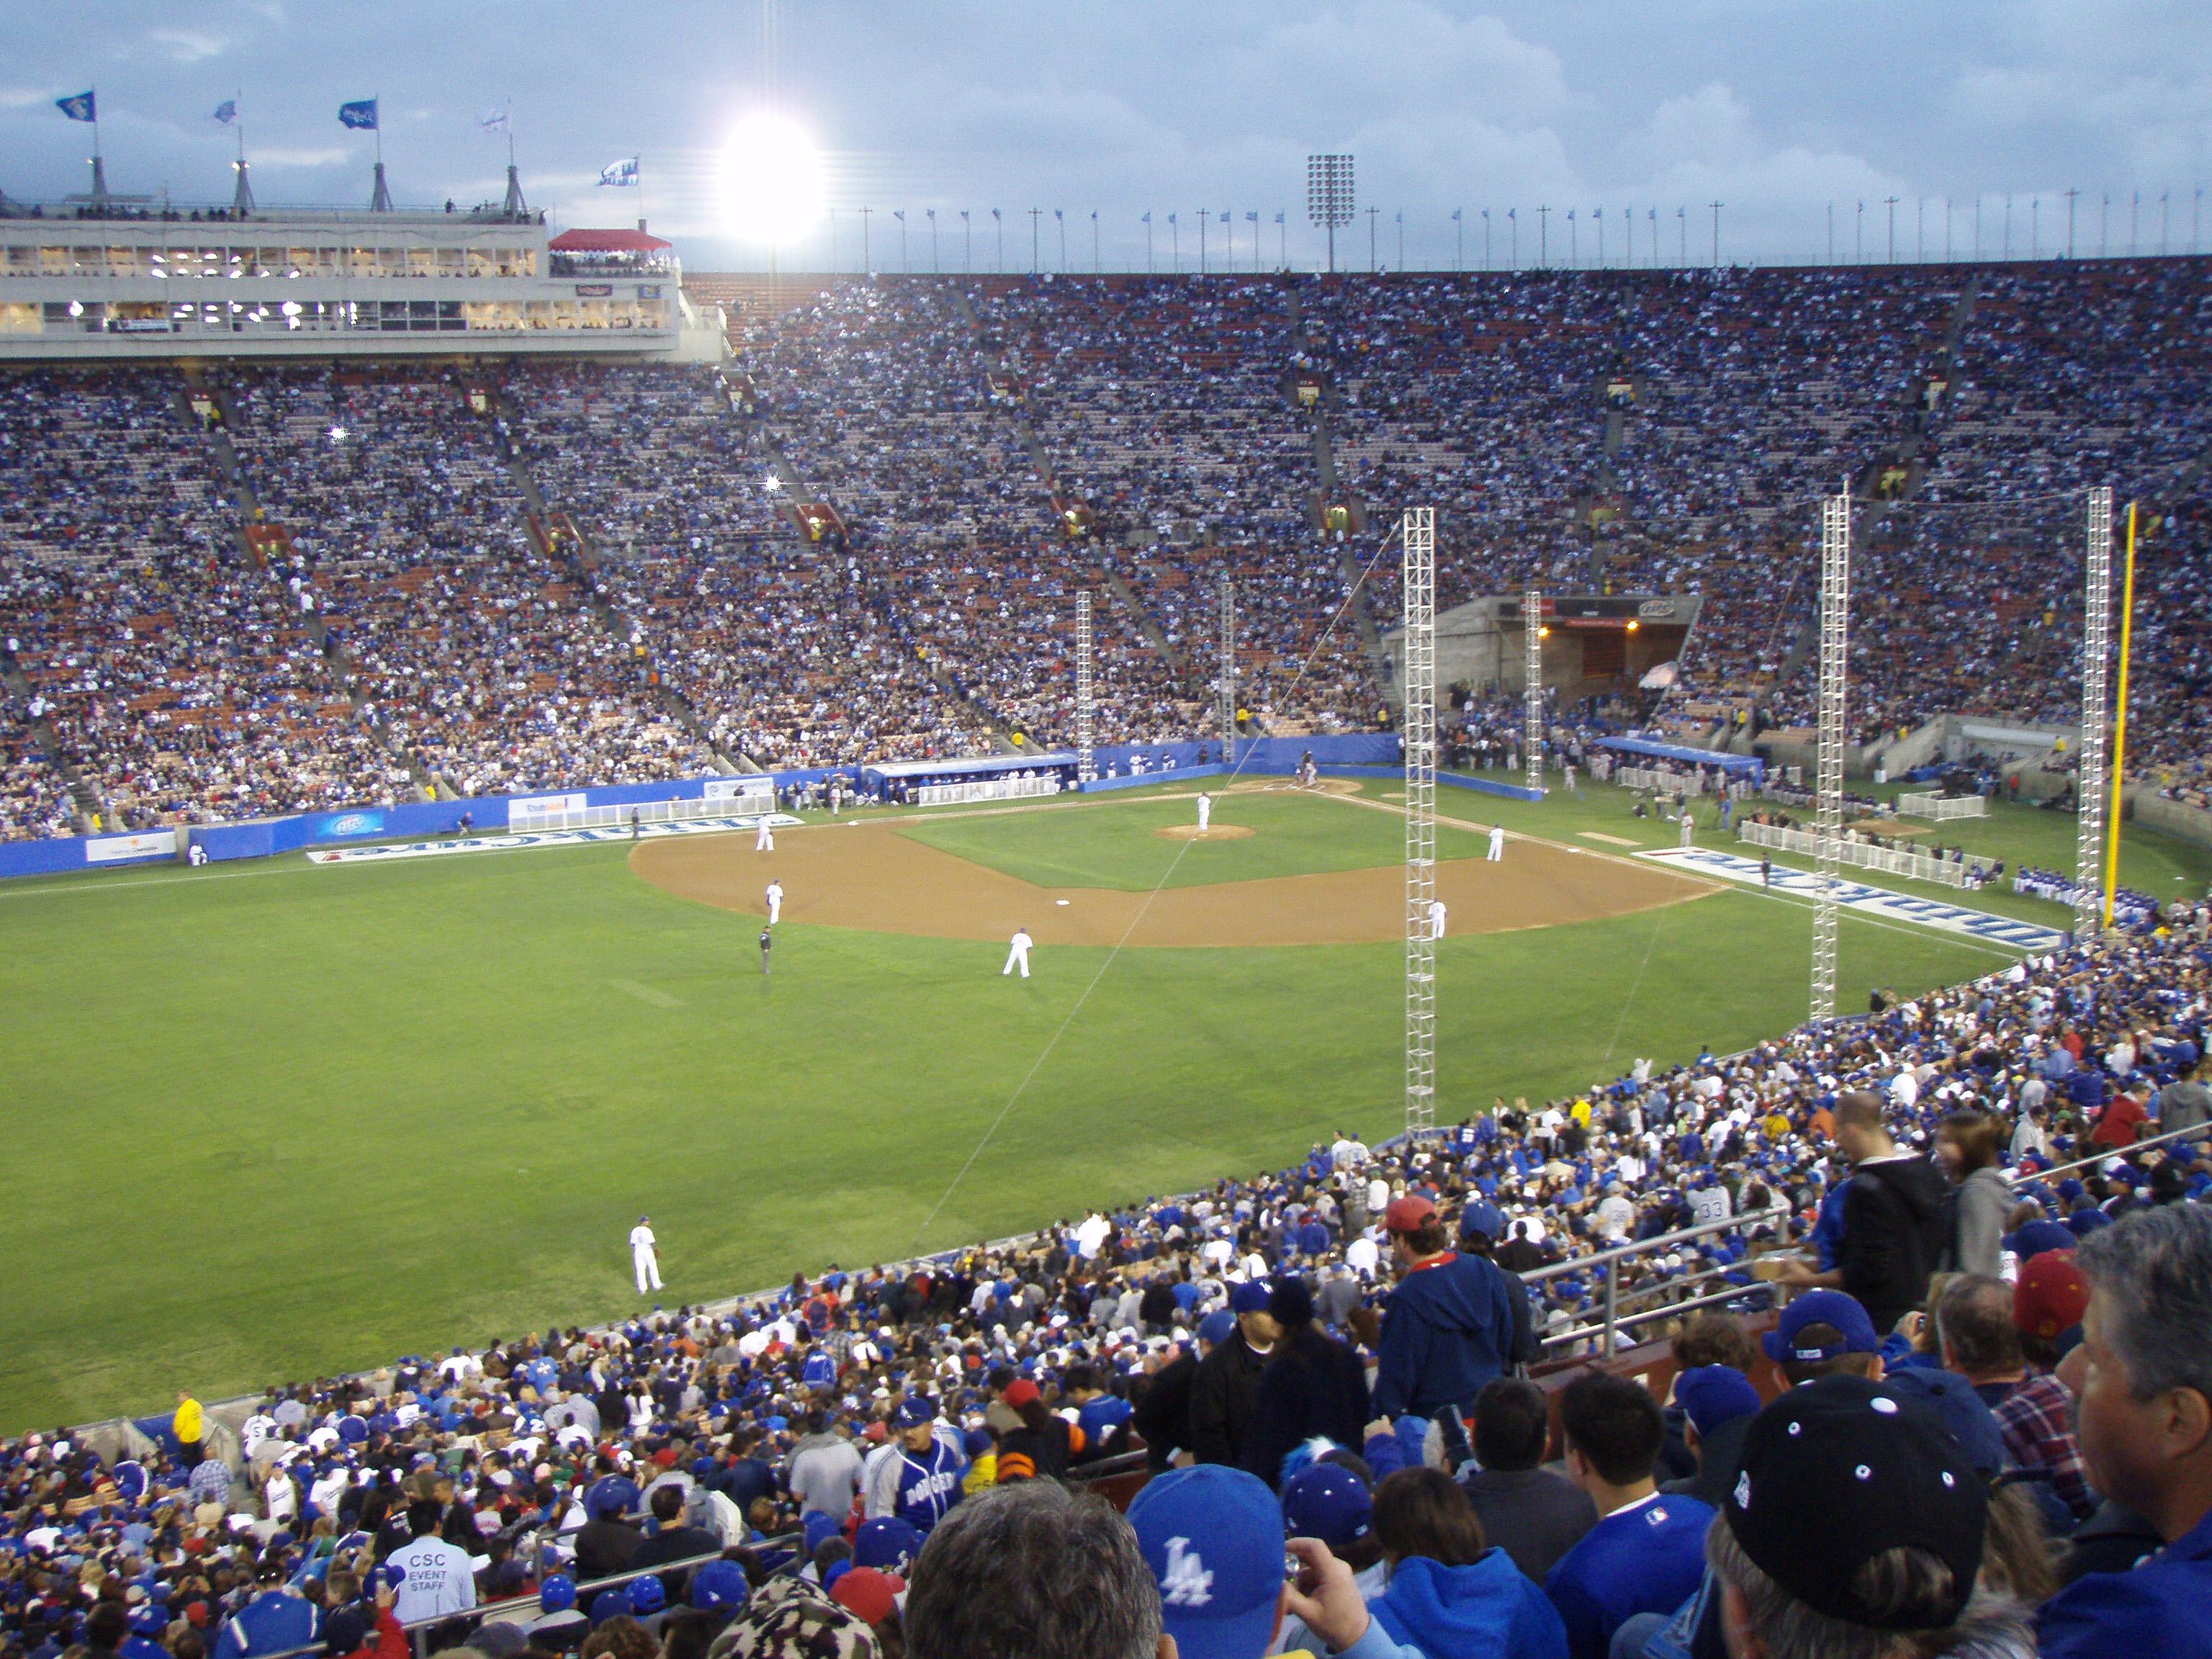 baseball game red sox